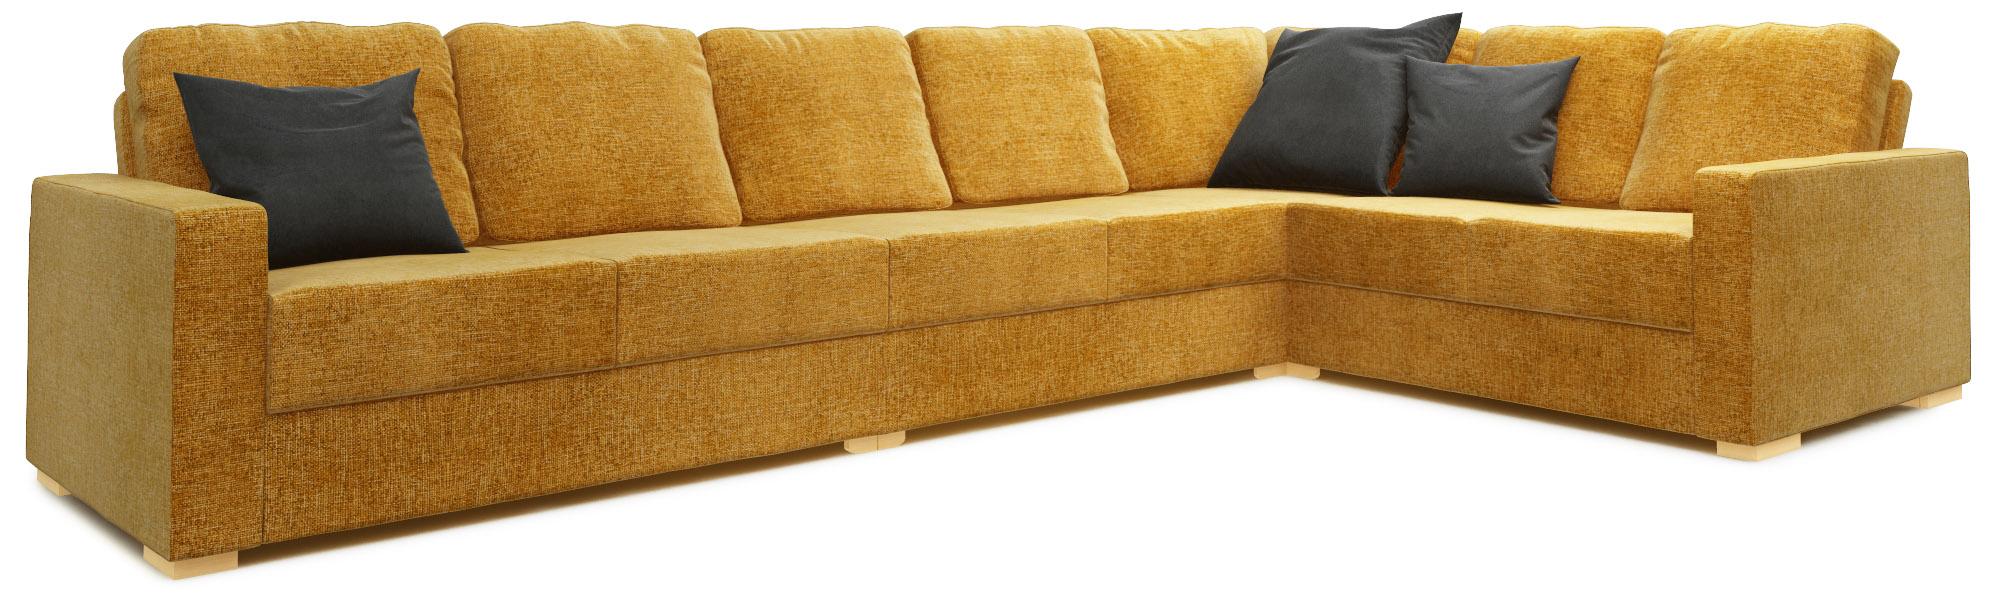 Lear 5X3 Corner Single Sofa Bed